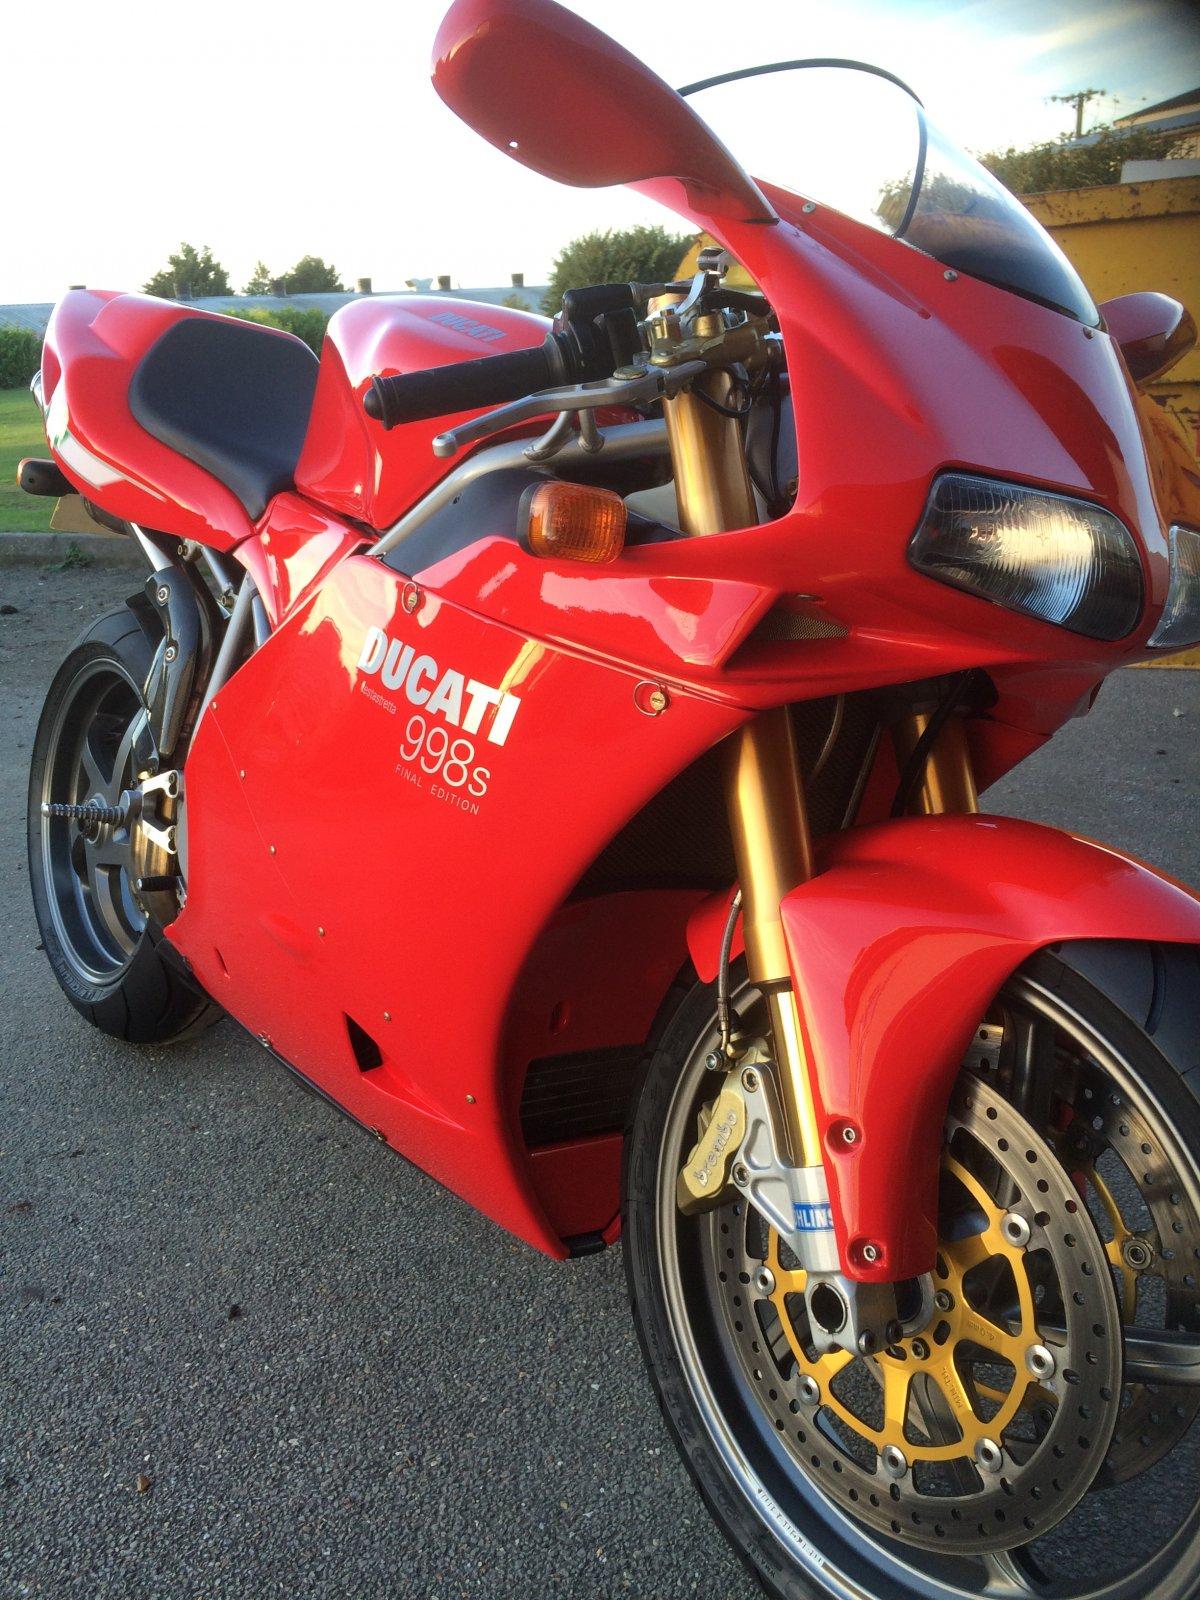 For Sale - Ducati 998s Final Edition   Ducati Forum